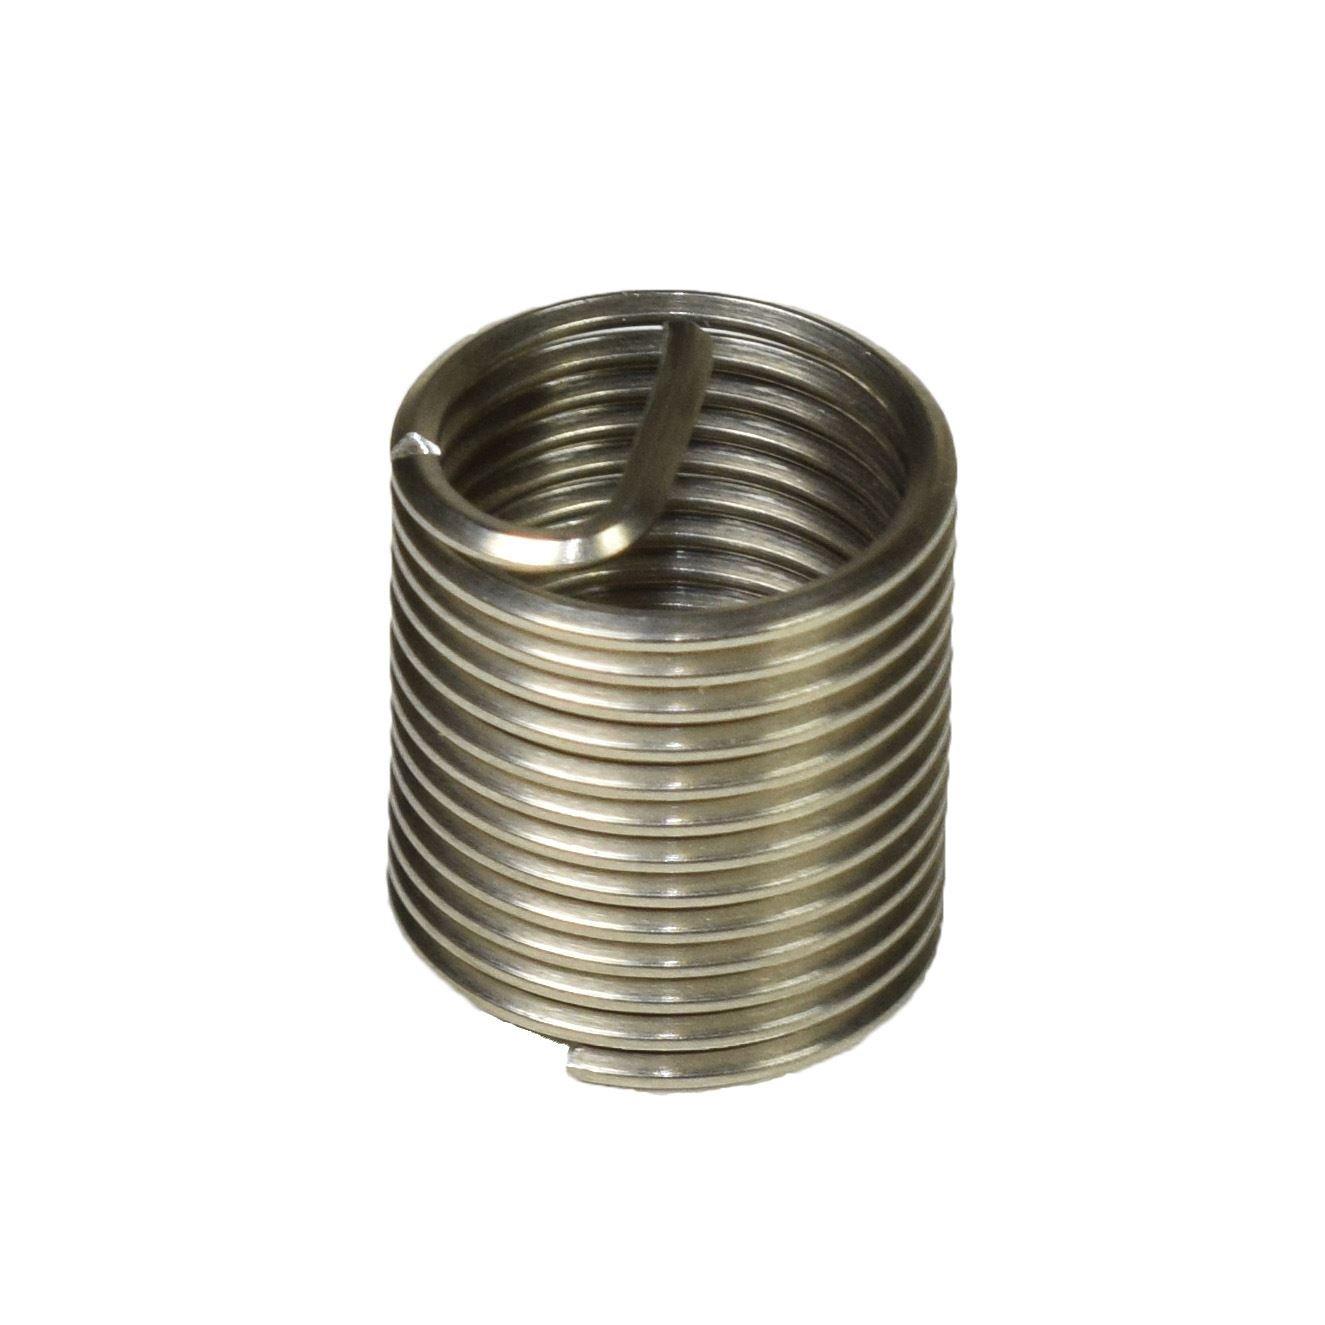 Helicoil Type Thread Repair Inserts 1//2 UNF x 1.5D 10pc Wire Thread Insert